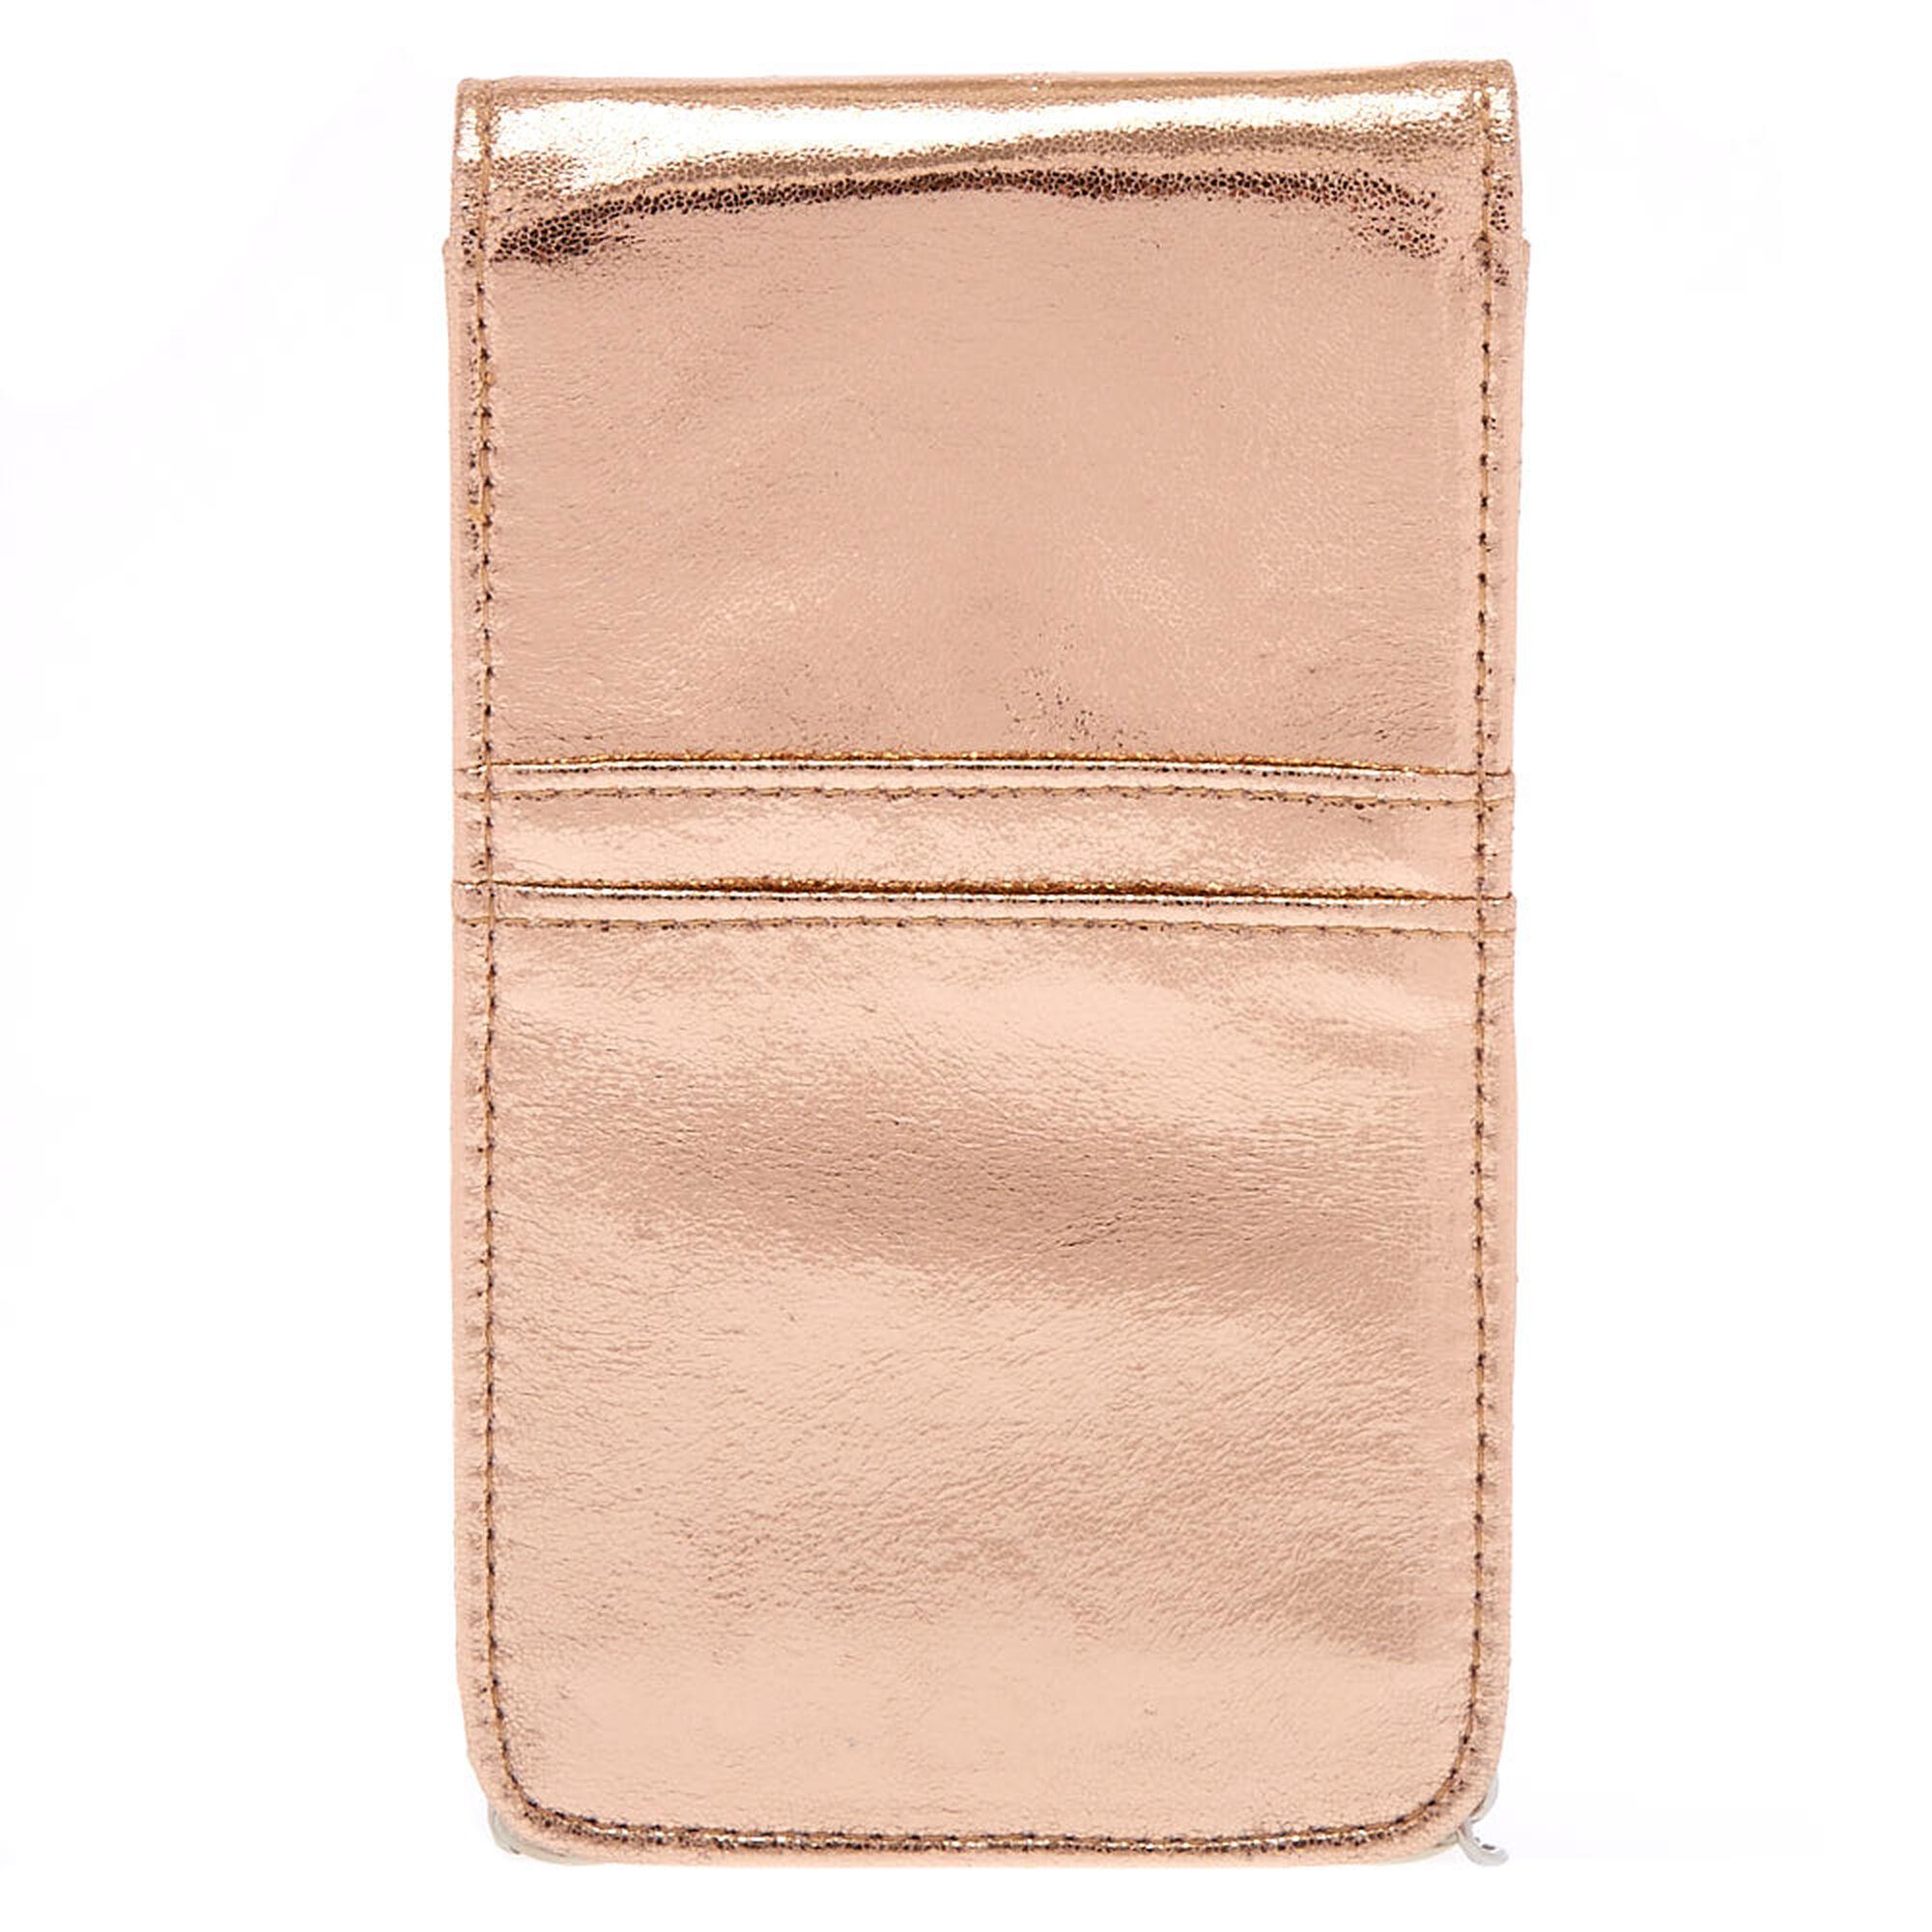 Metallic Rose Gold Tech Crossbody Bag